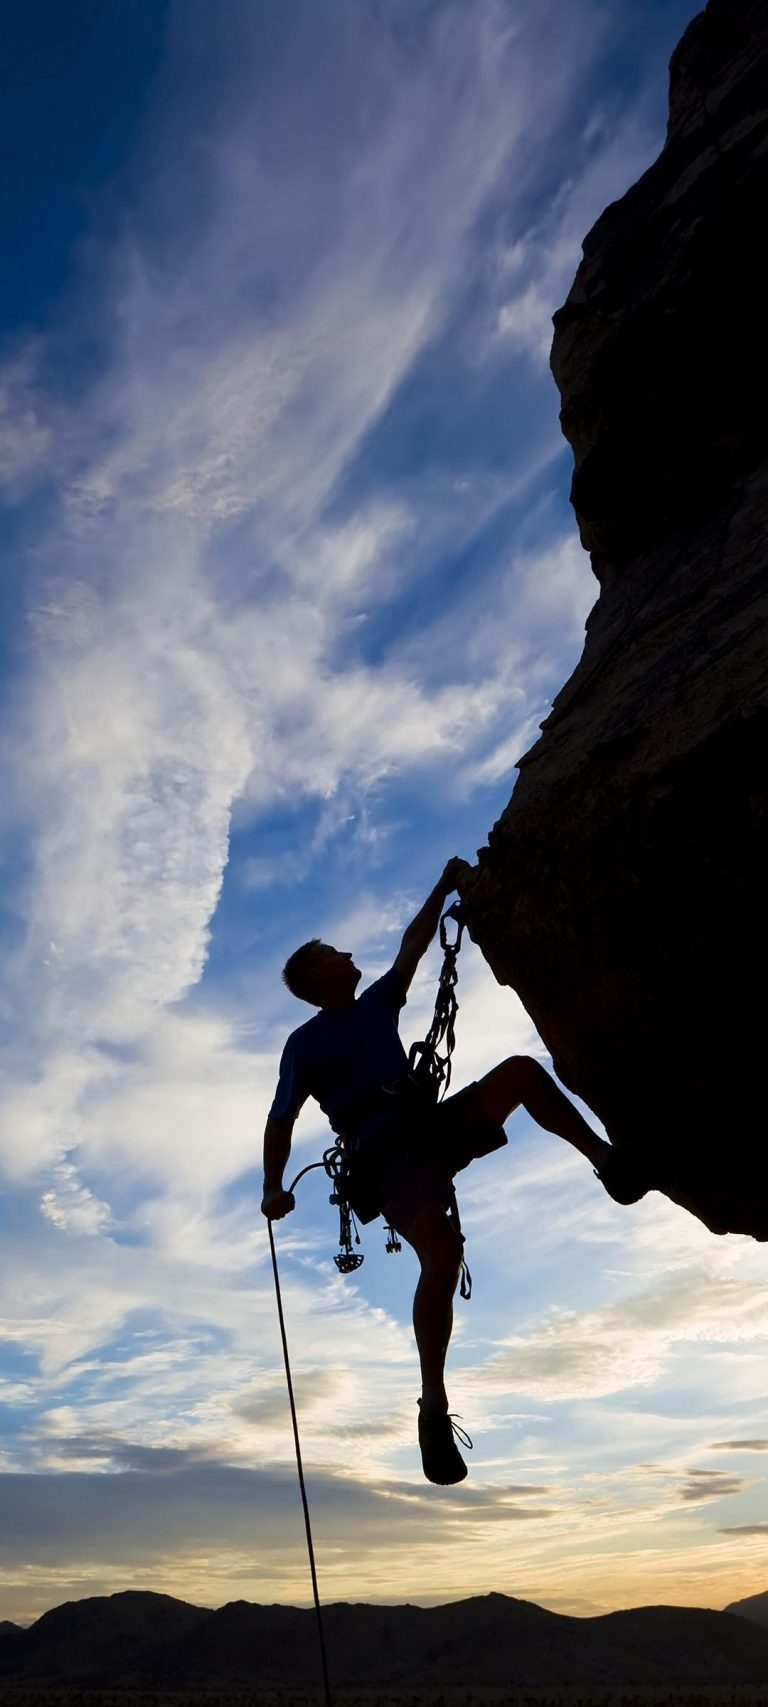 Climber Extreme Silhouette Climbing 1080x2400 768x1707